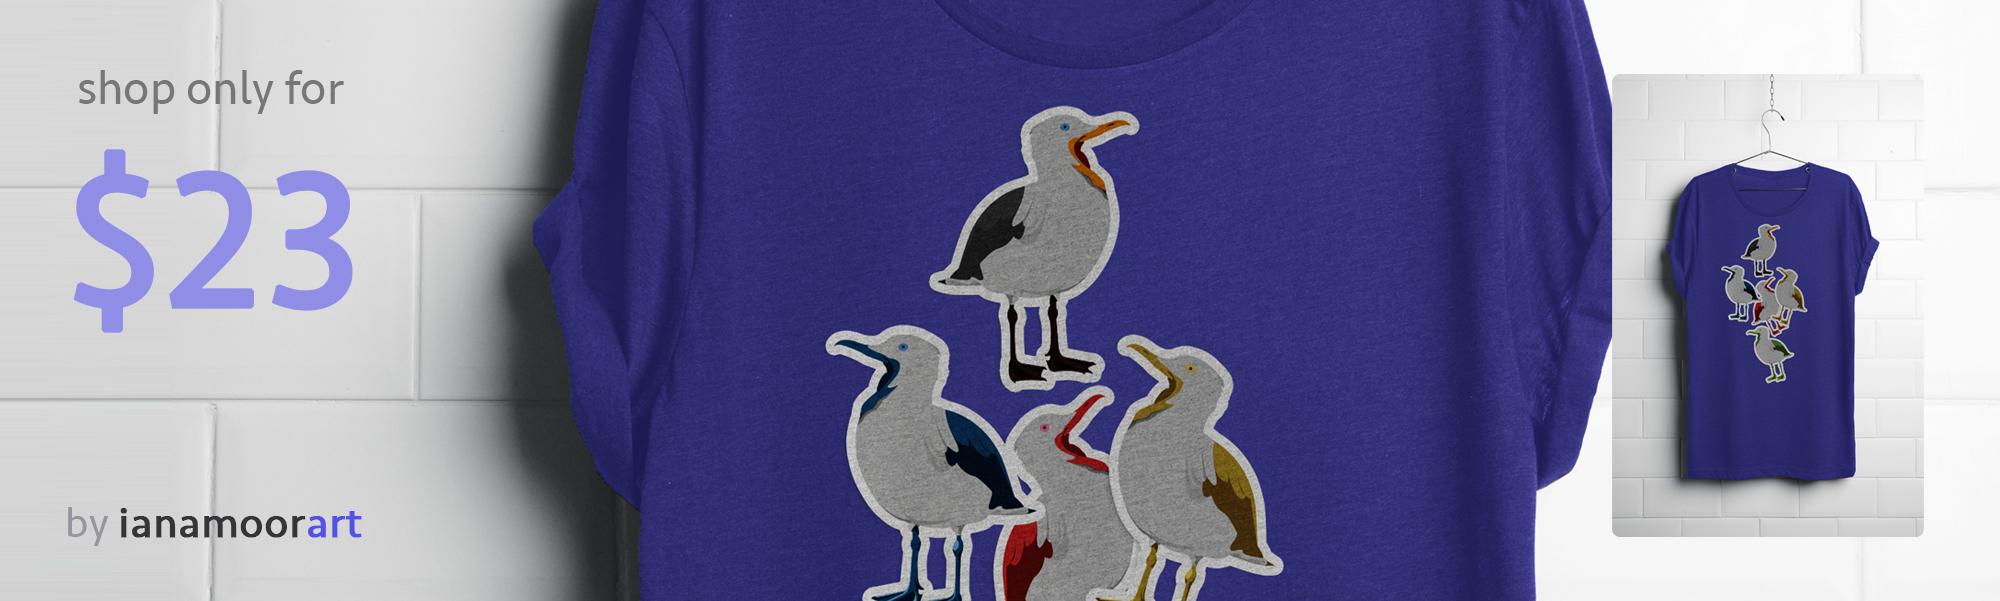 seagull_t-shirt